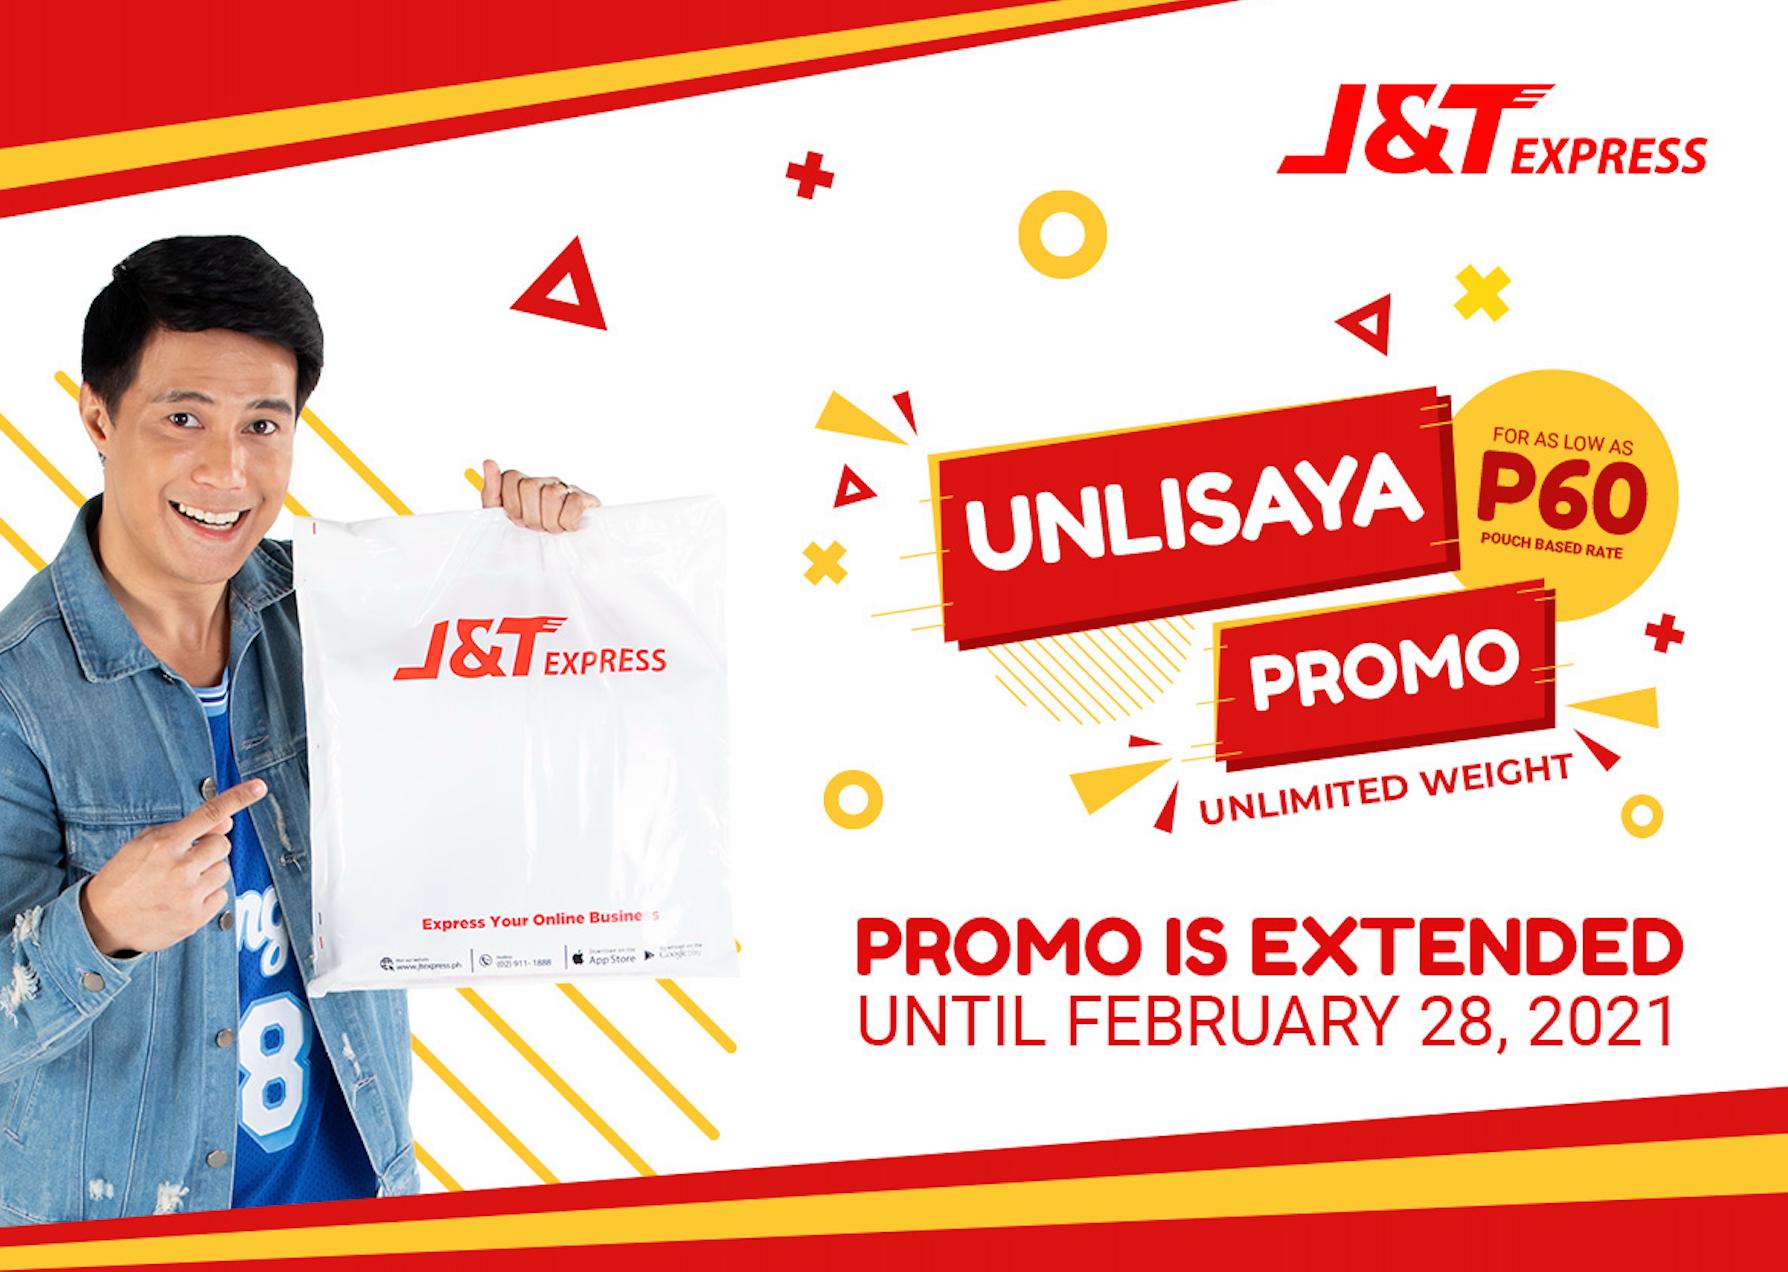 J&T Express UnliSaya promo extended!